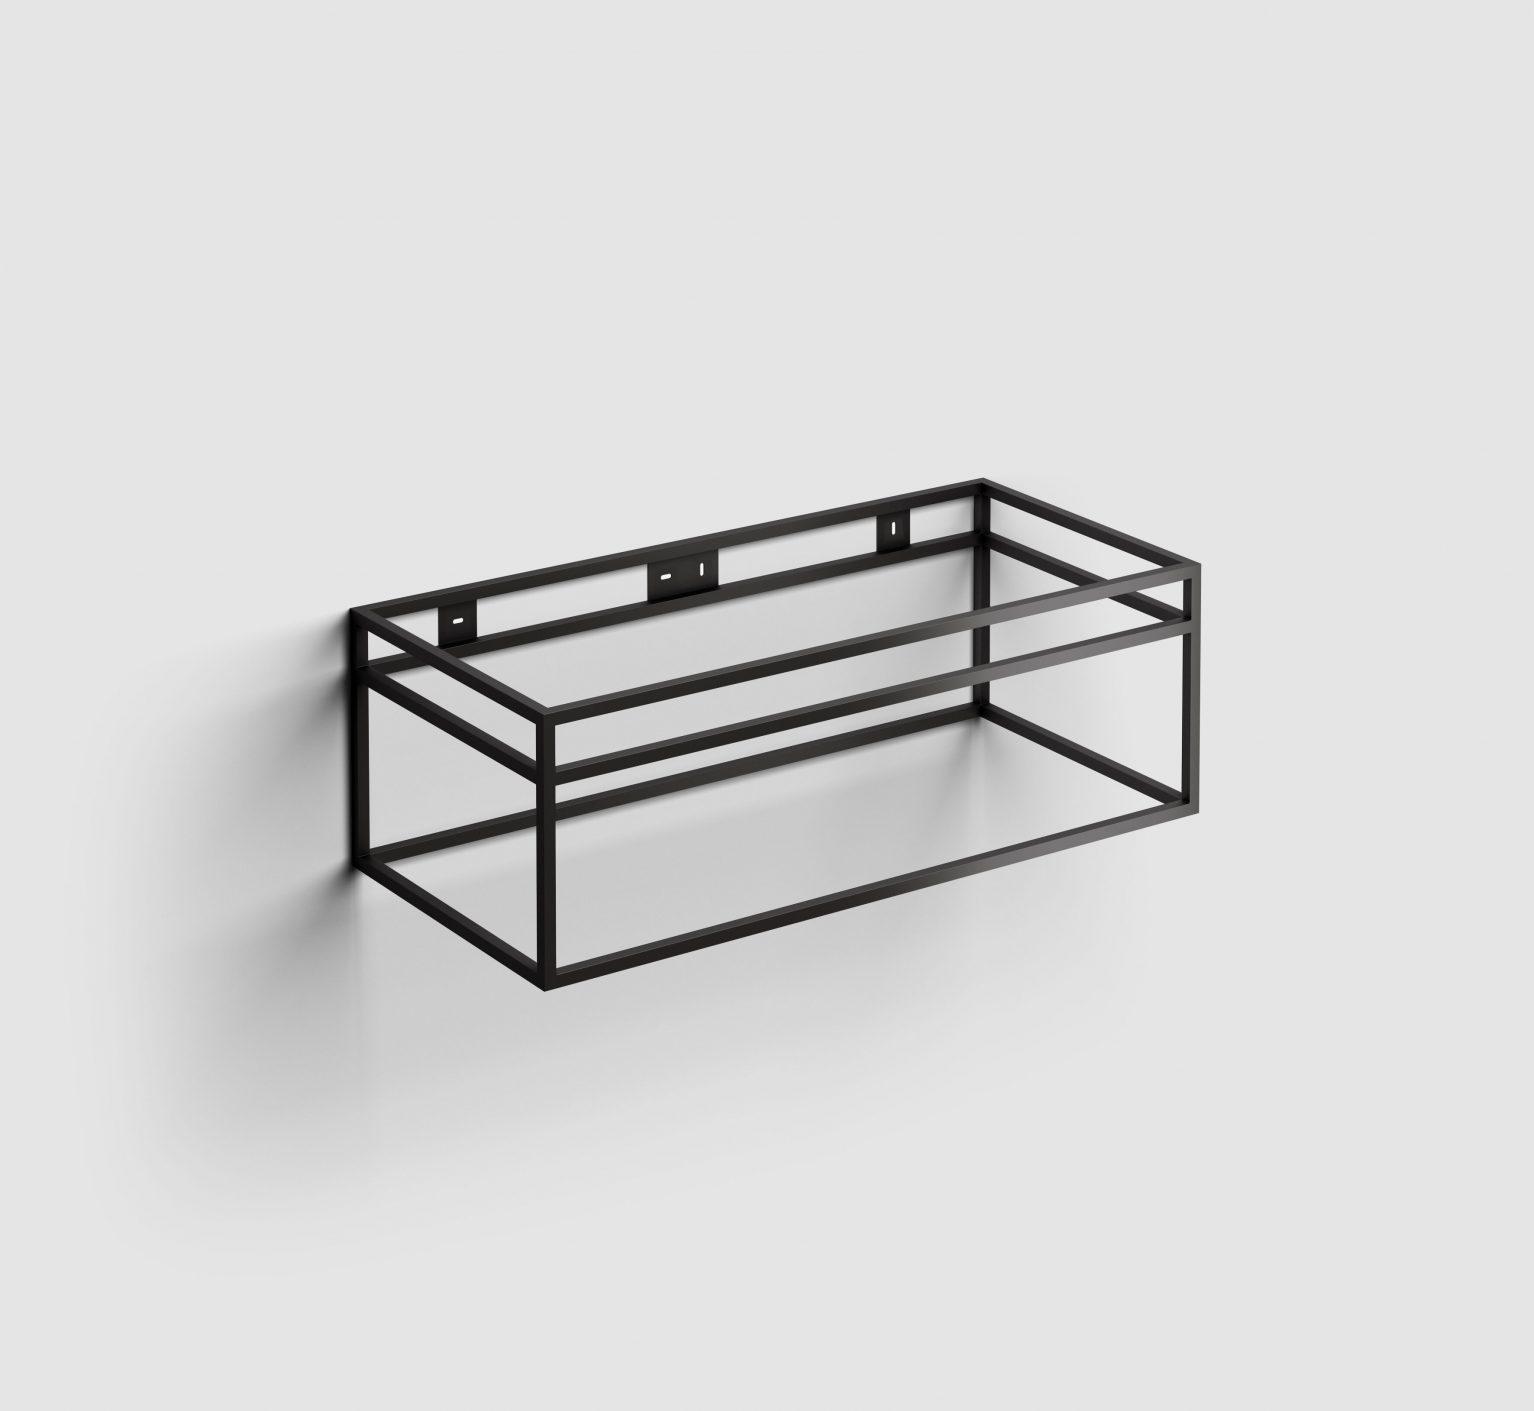 (New) Wash Me Frame rvs kokerprof. 90 cm mat zwart poederlak)